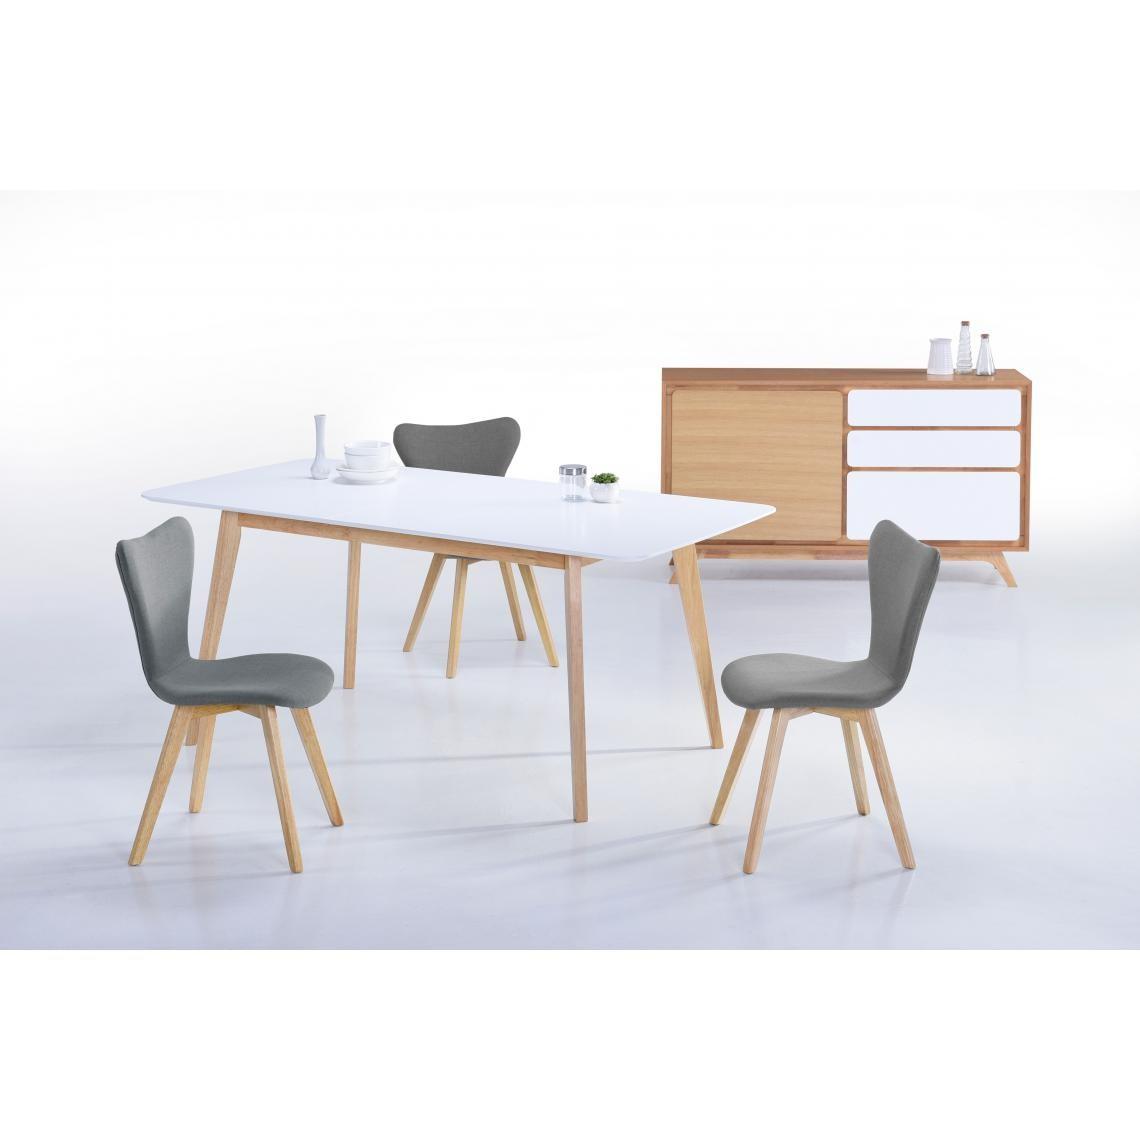 7e8c2f6dfa9f1 lot-de-2-chaises-grises-claxton-design_190958-7_1140x1140.jpg